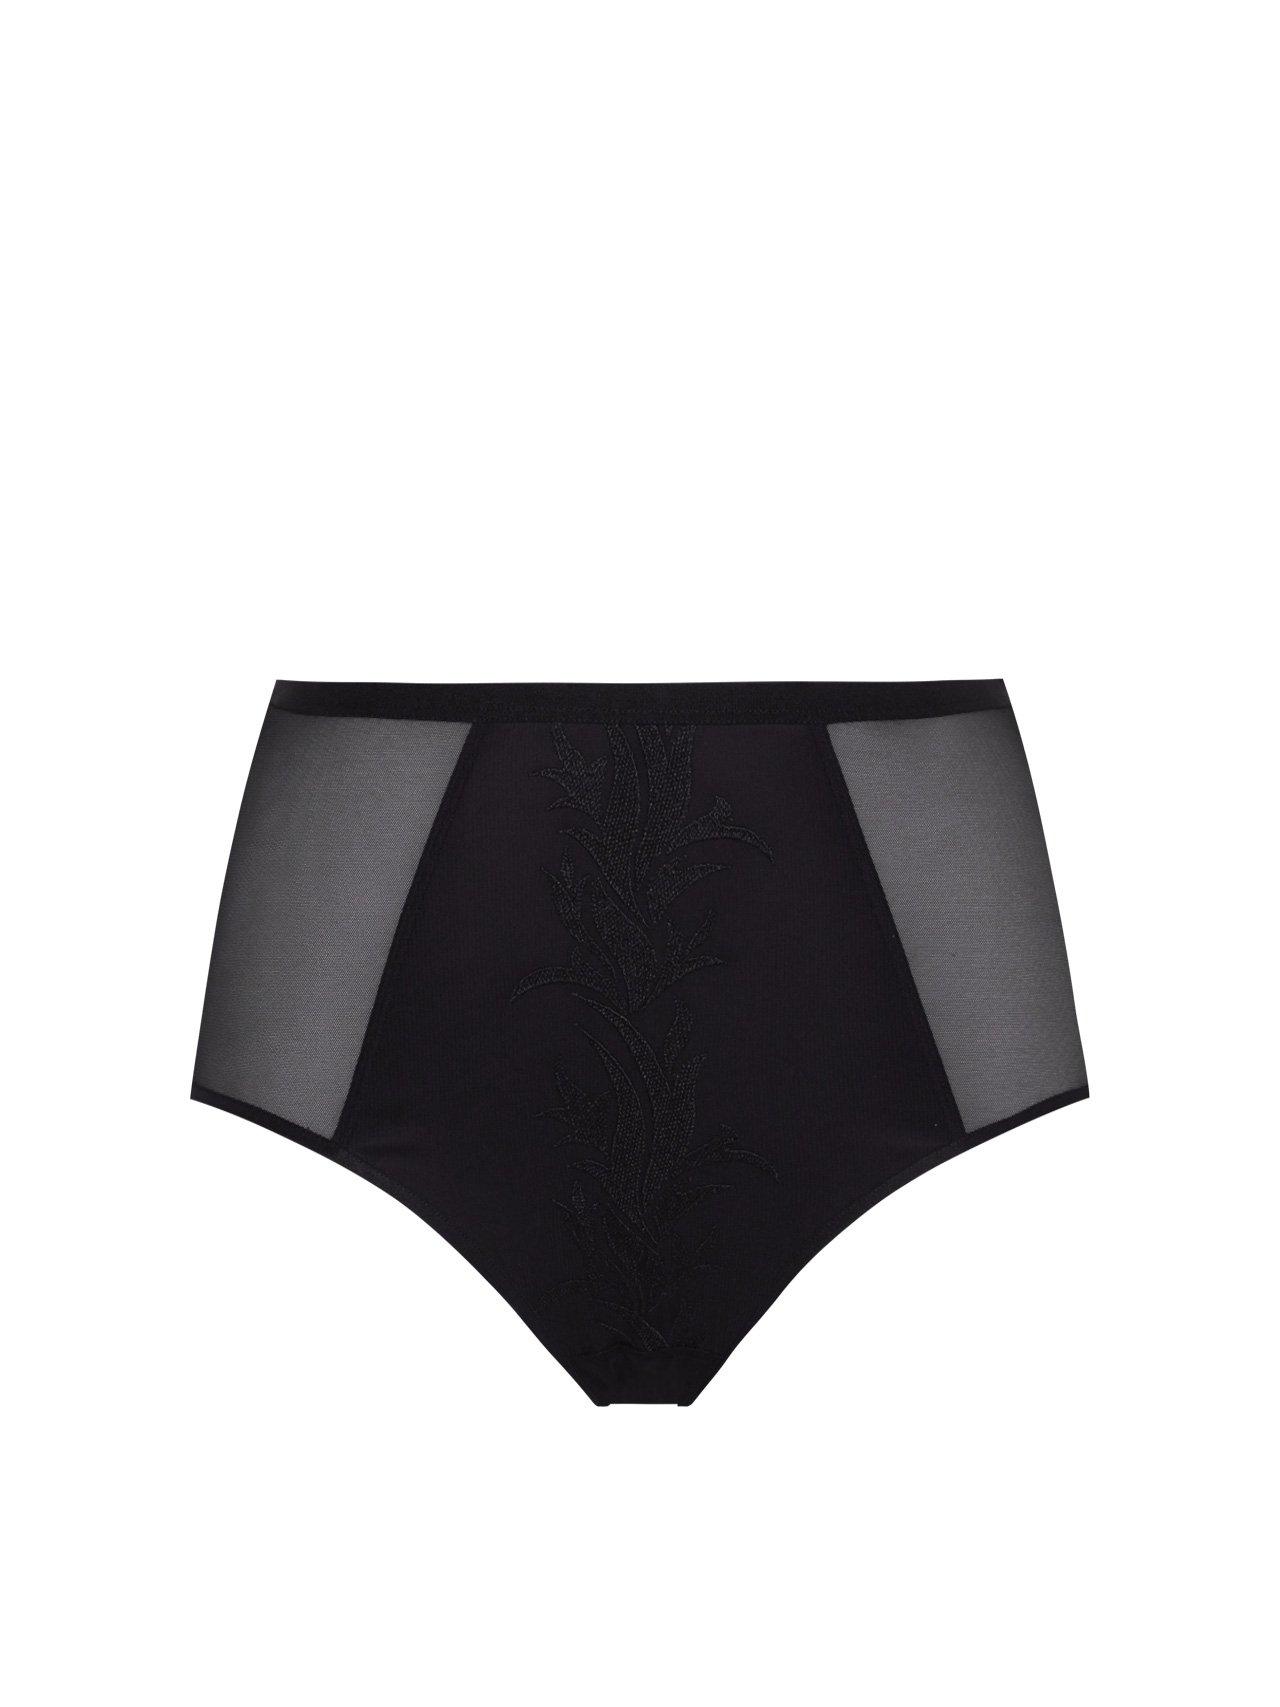 Quần lưng cao - High waist brief - 0327A